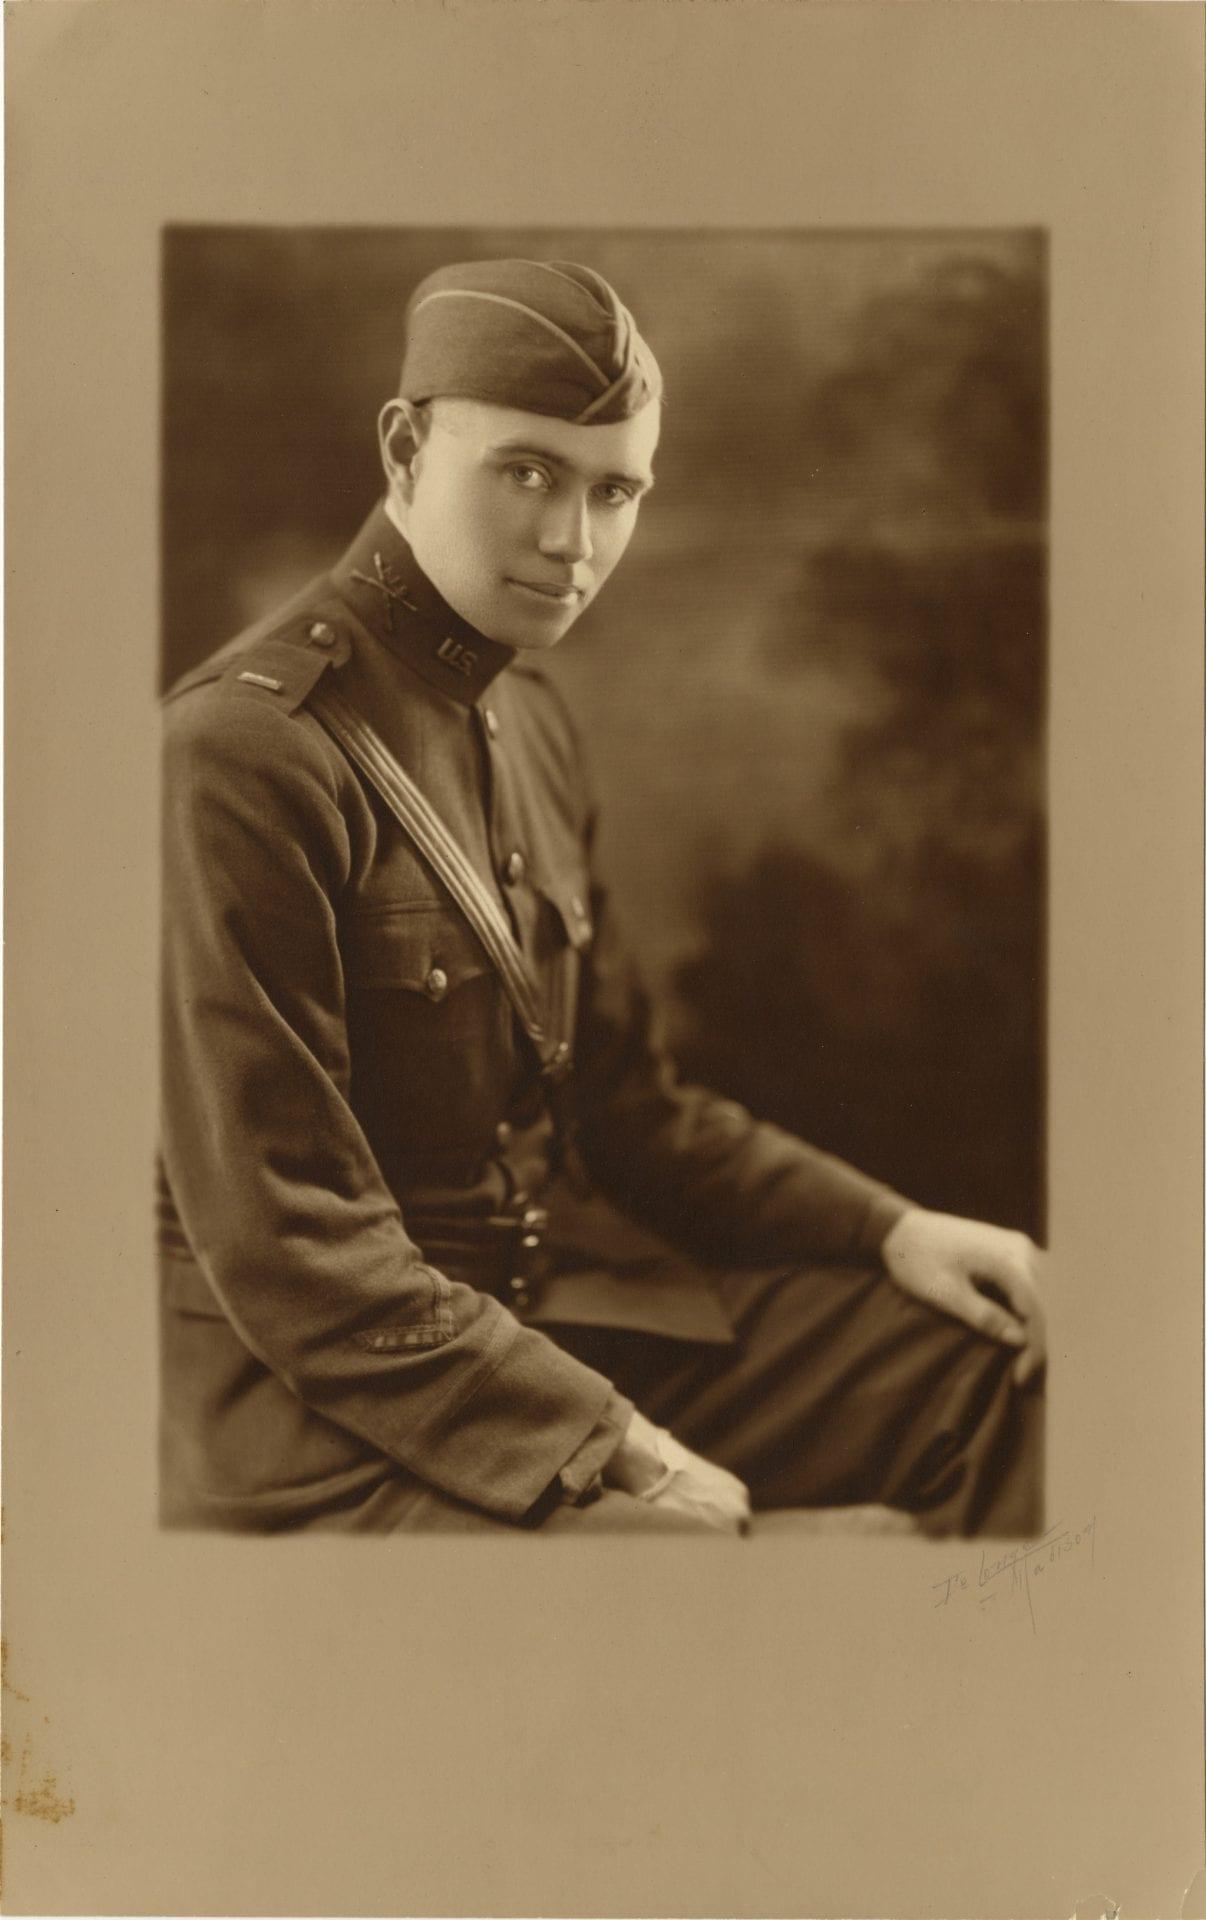 Fuller Service Photo